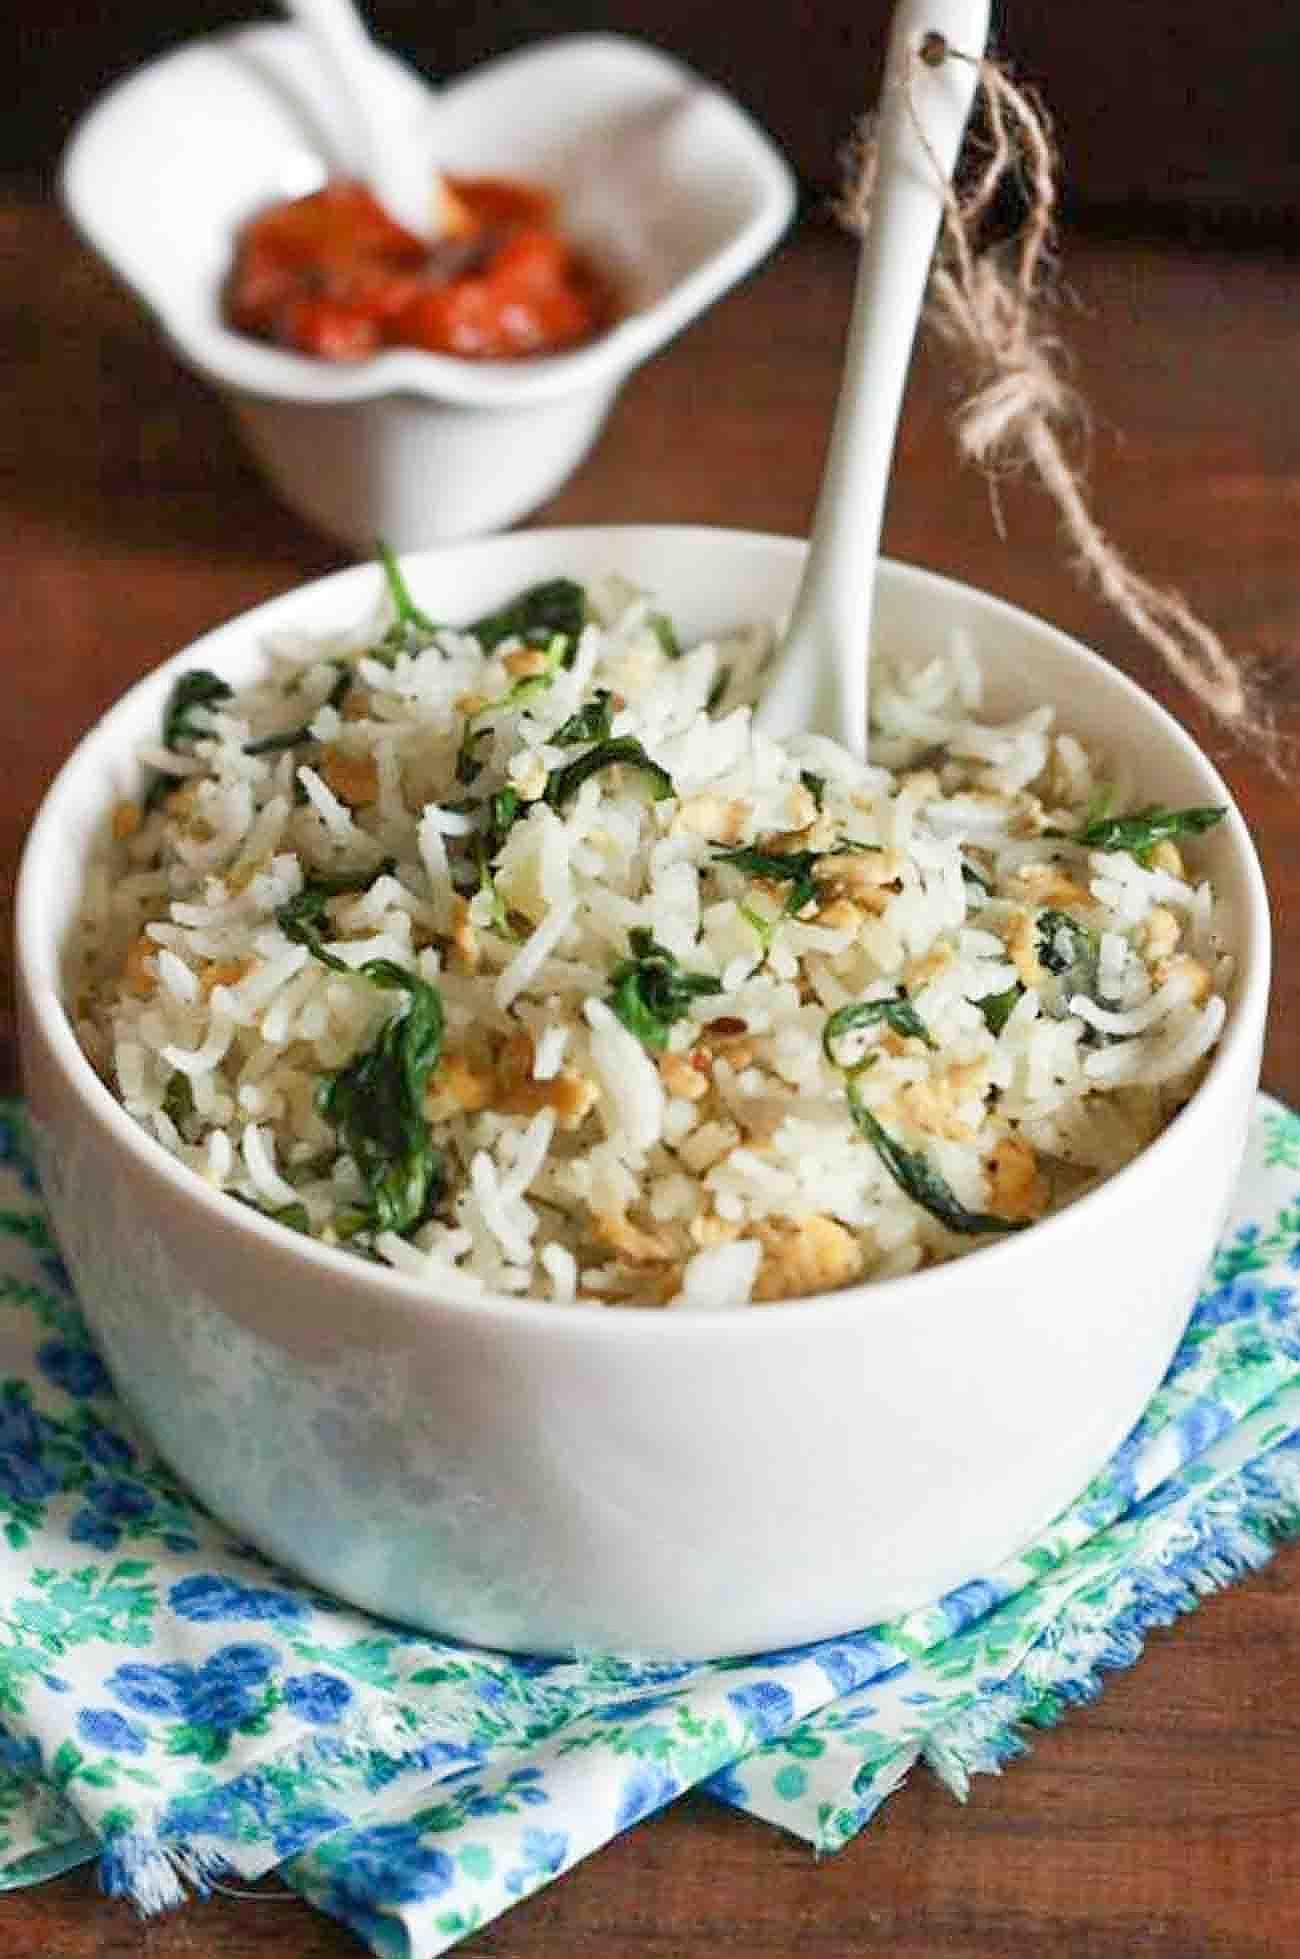 Fenugreek & Egg Fried Rice Recipe (Anda Methi Chawal) By